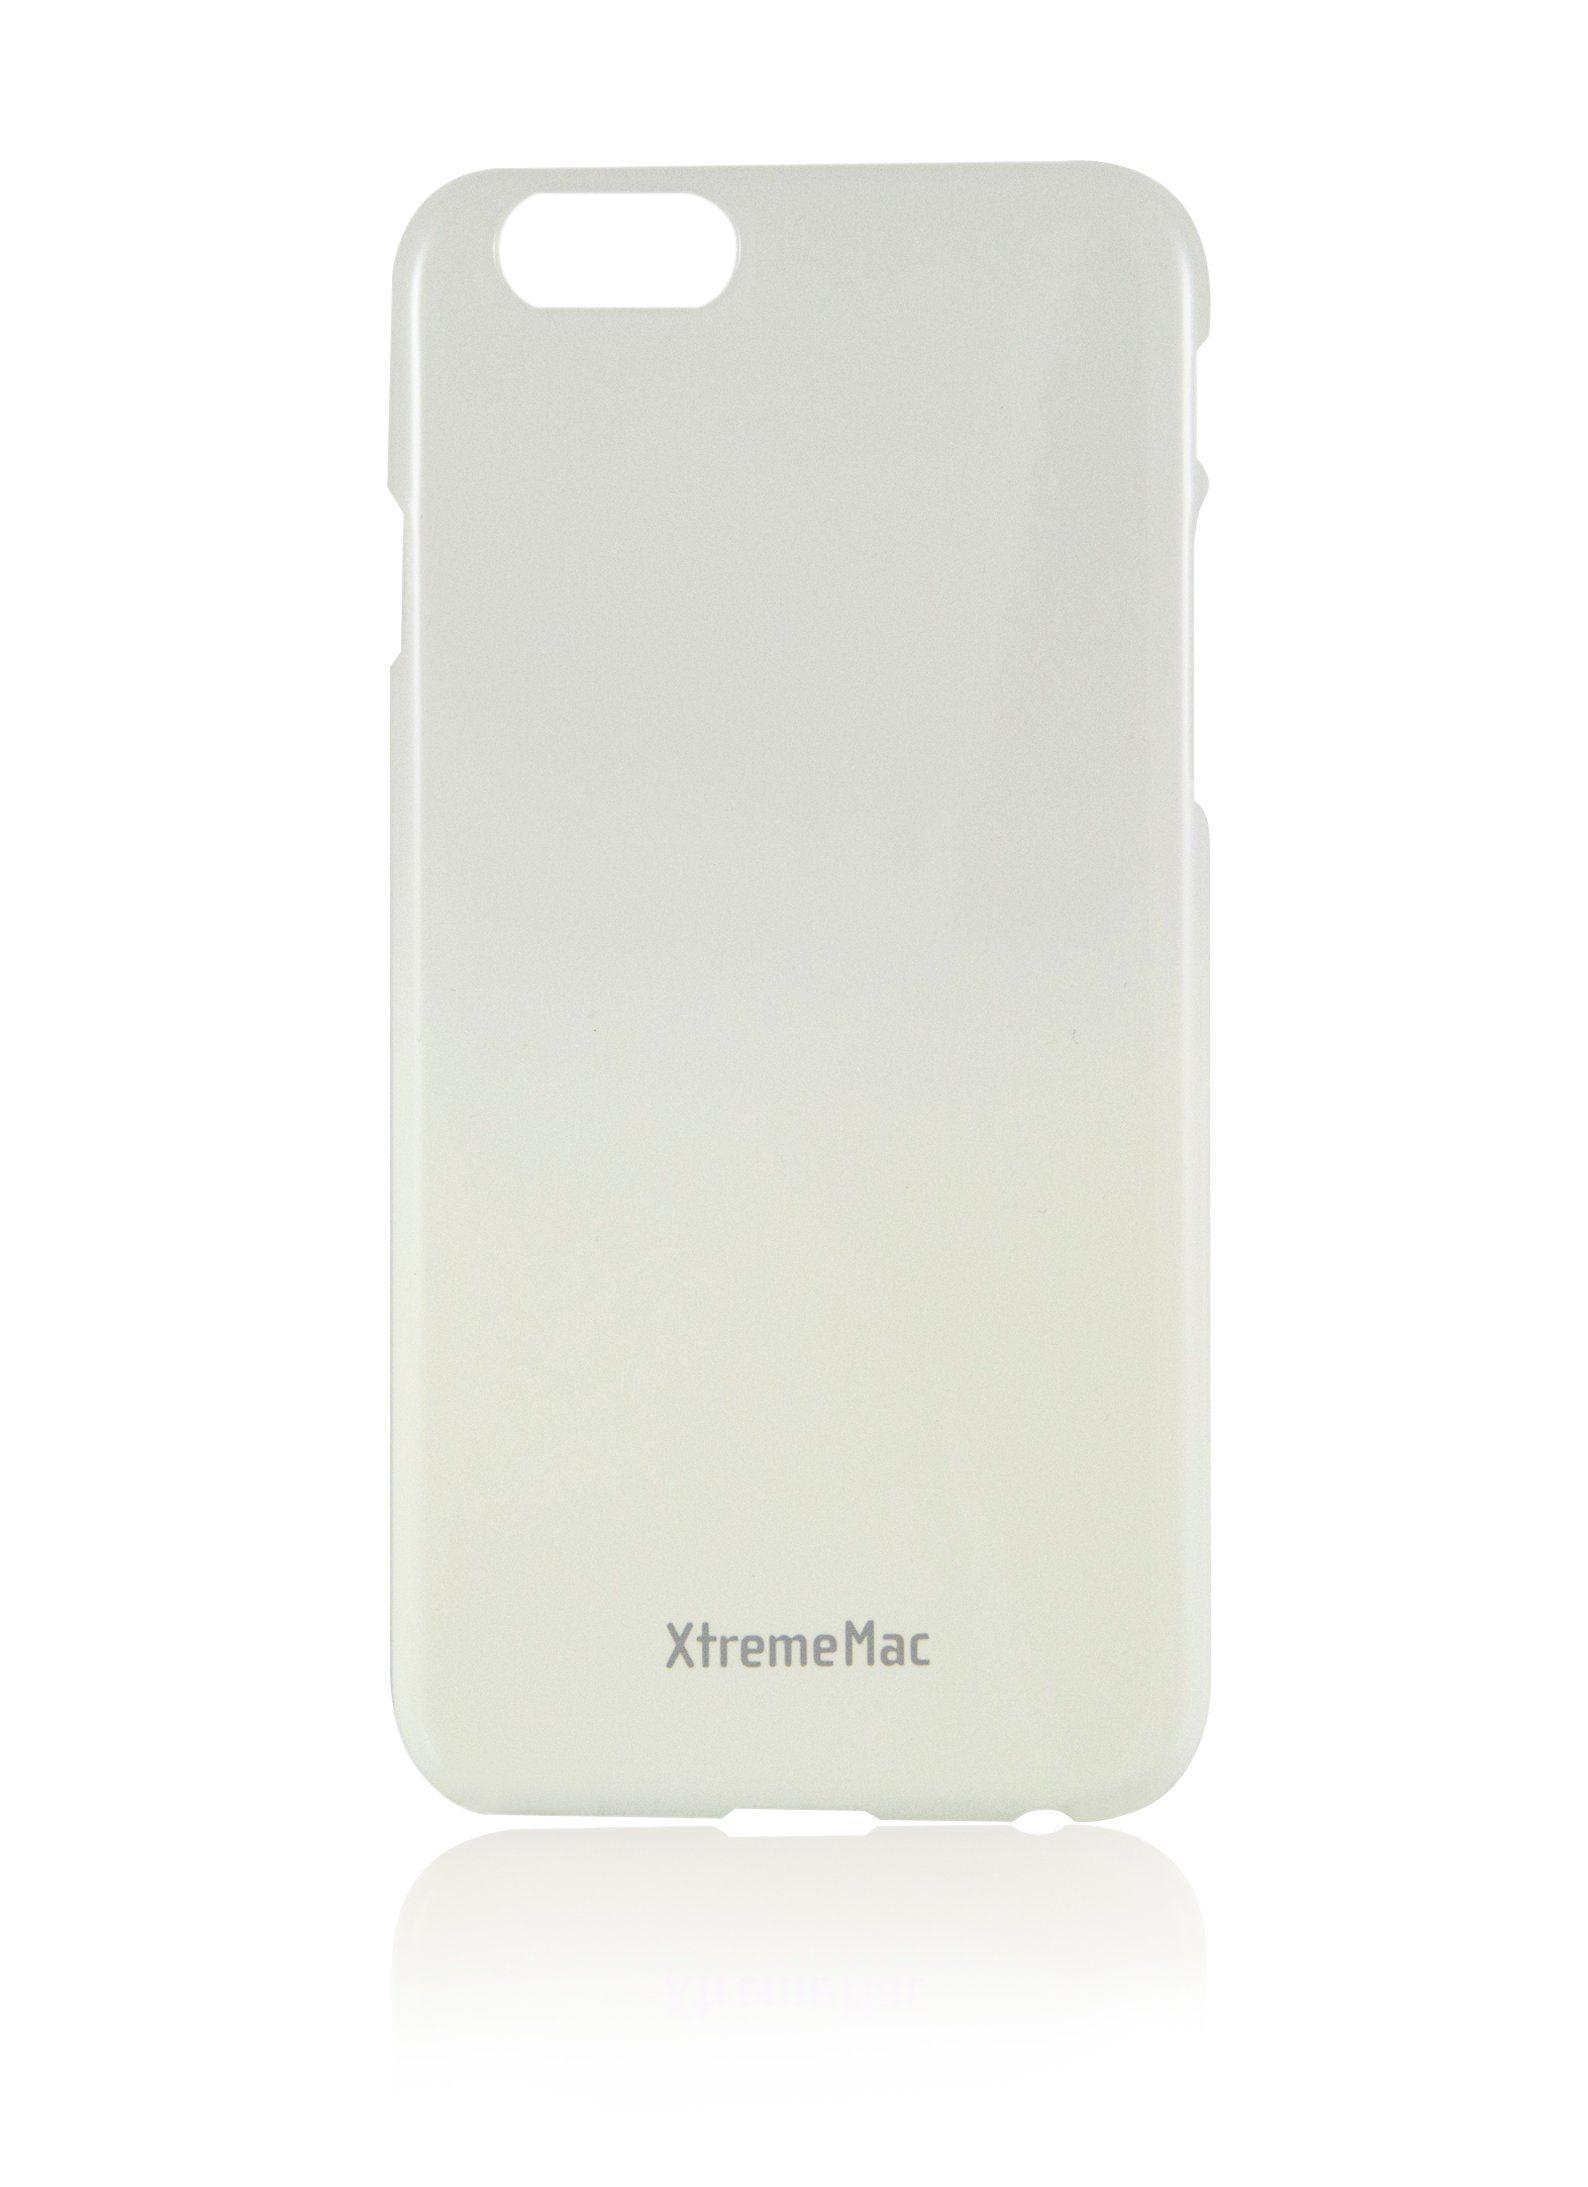 XtremeMac Schutzhülle für iPhone 6+/6S+ »Microshield Fade«